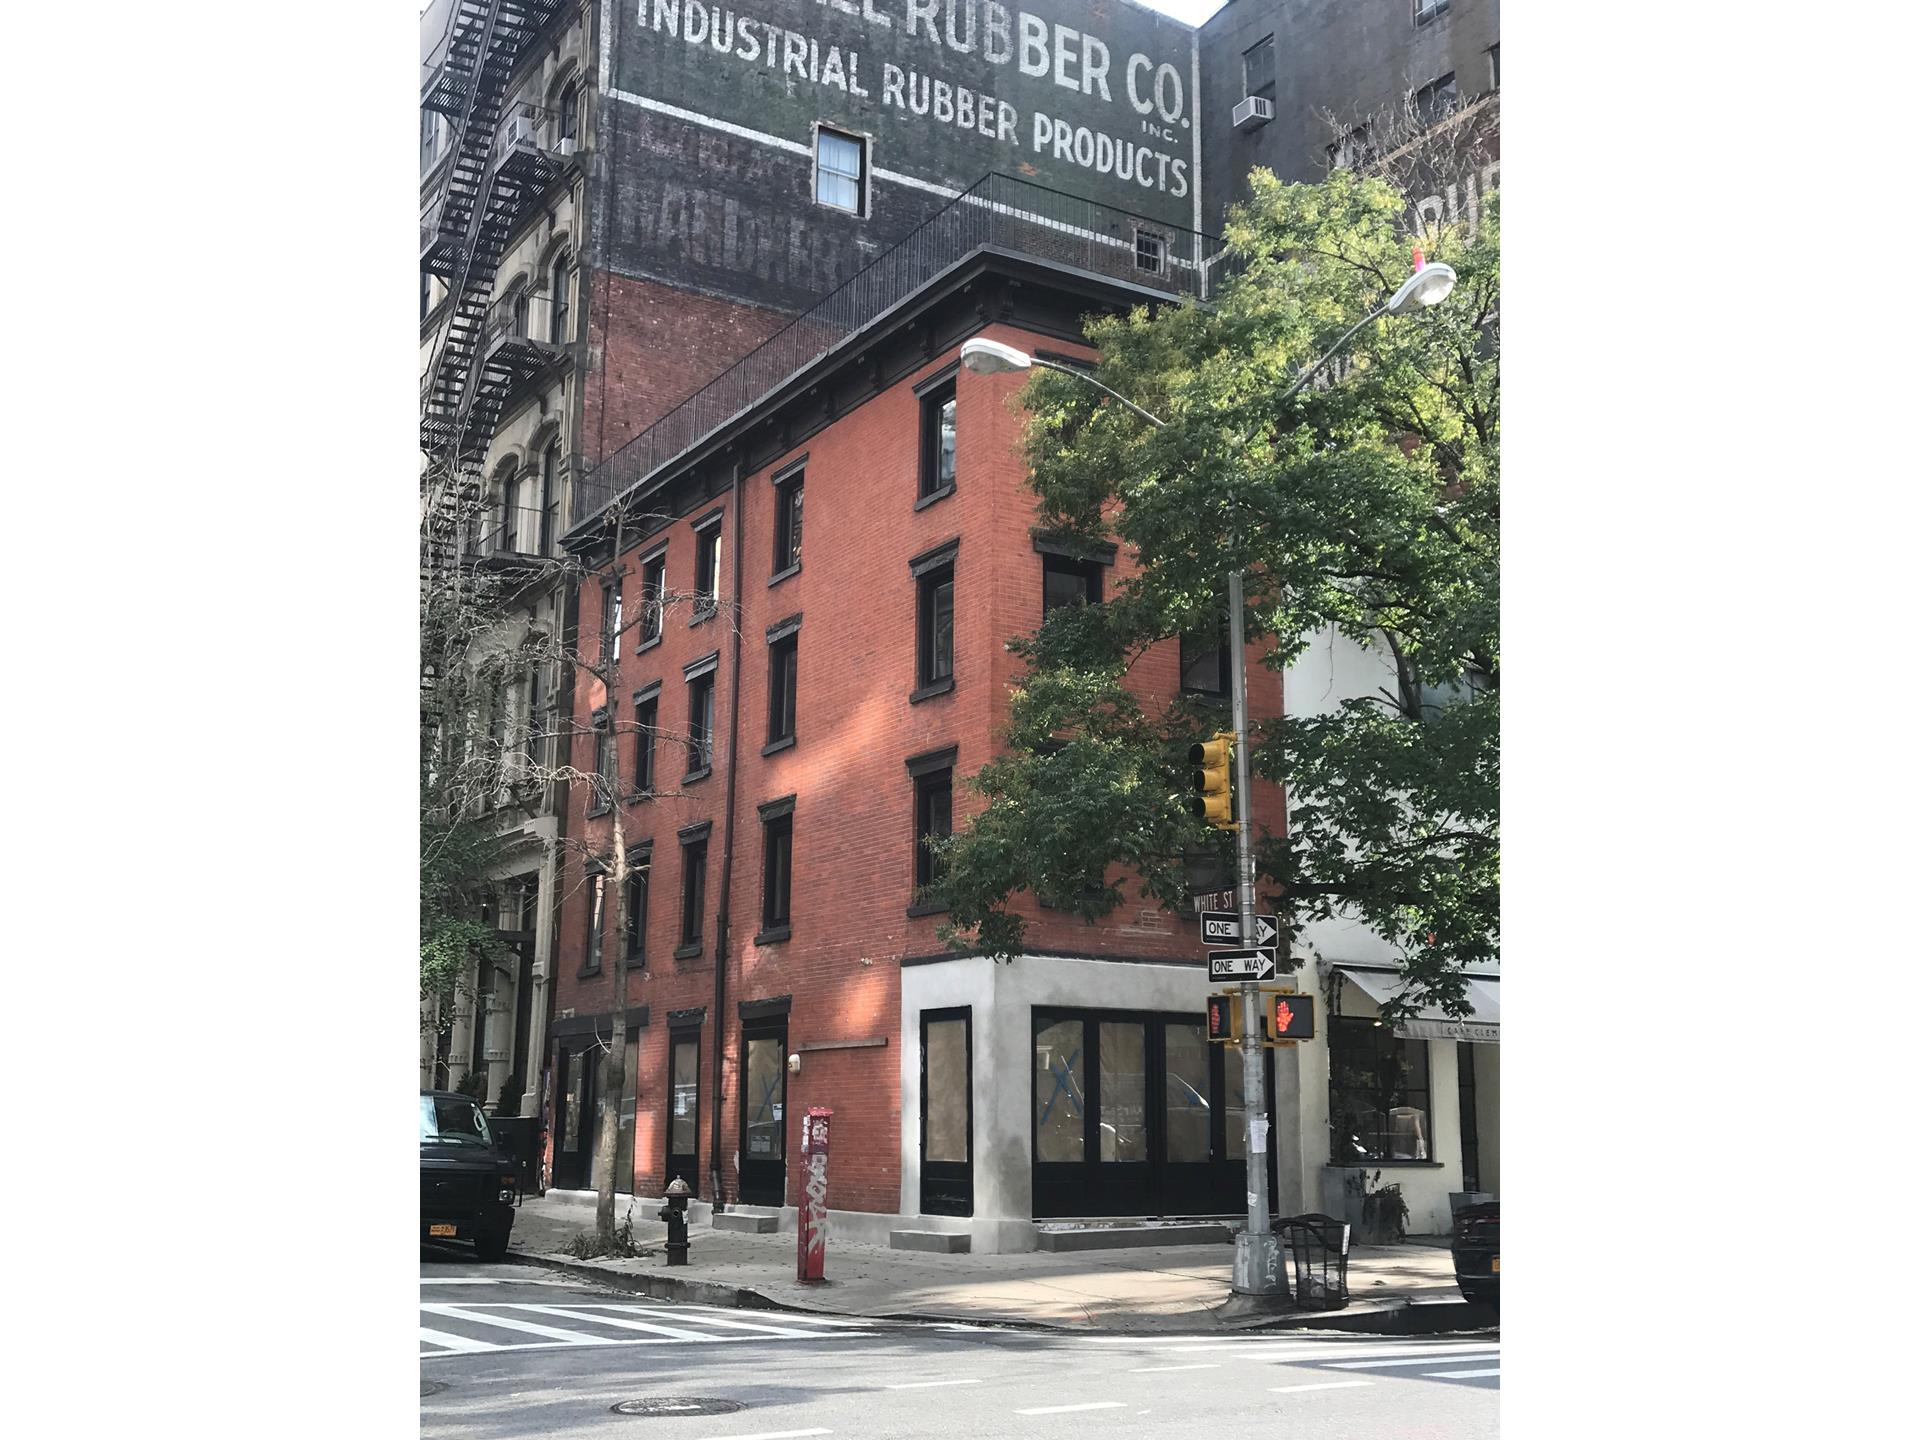 Villas / Townhouses for Sale at 1 White Street 1 White St New York, New York,10013 United States